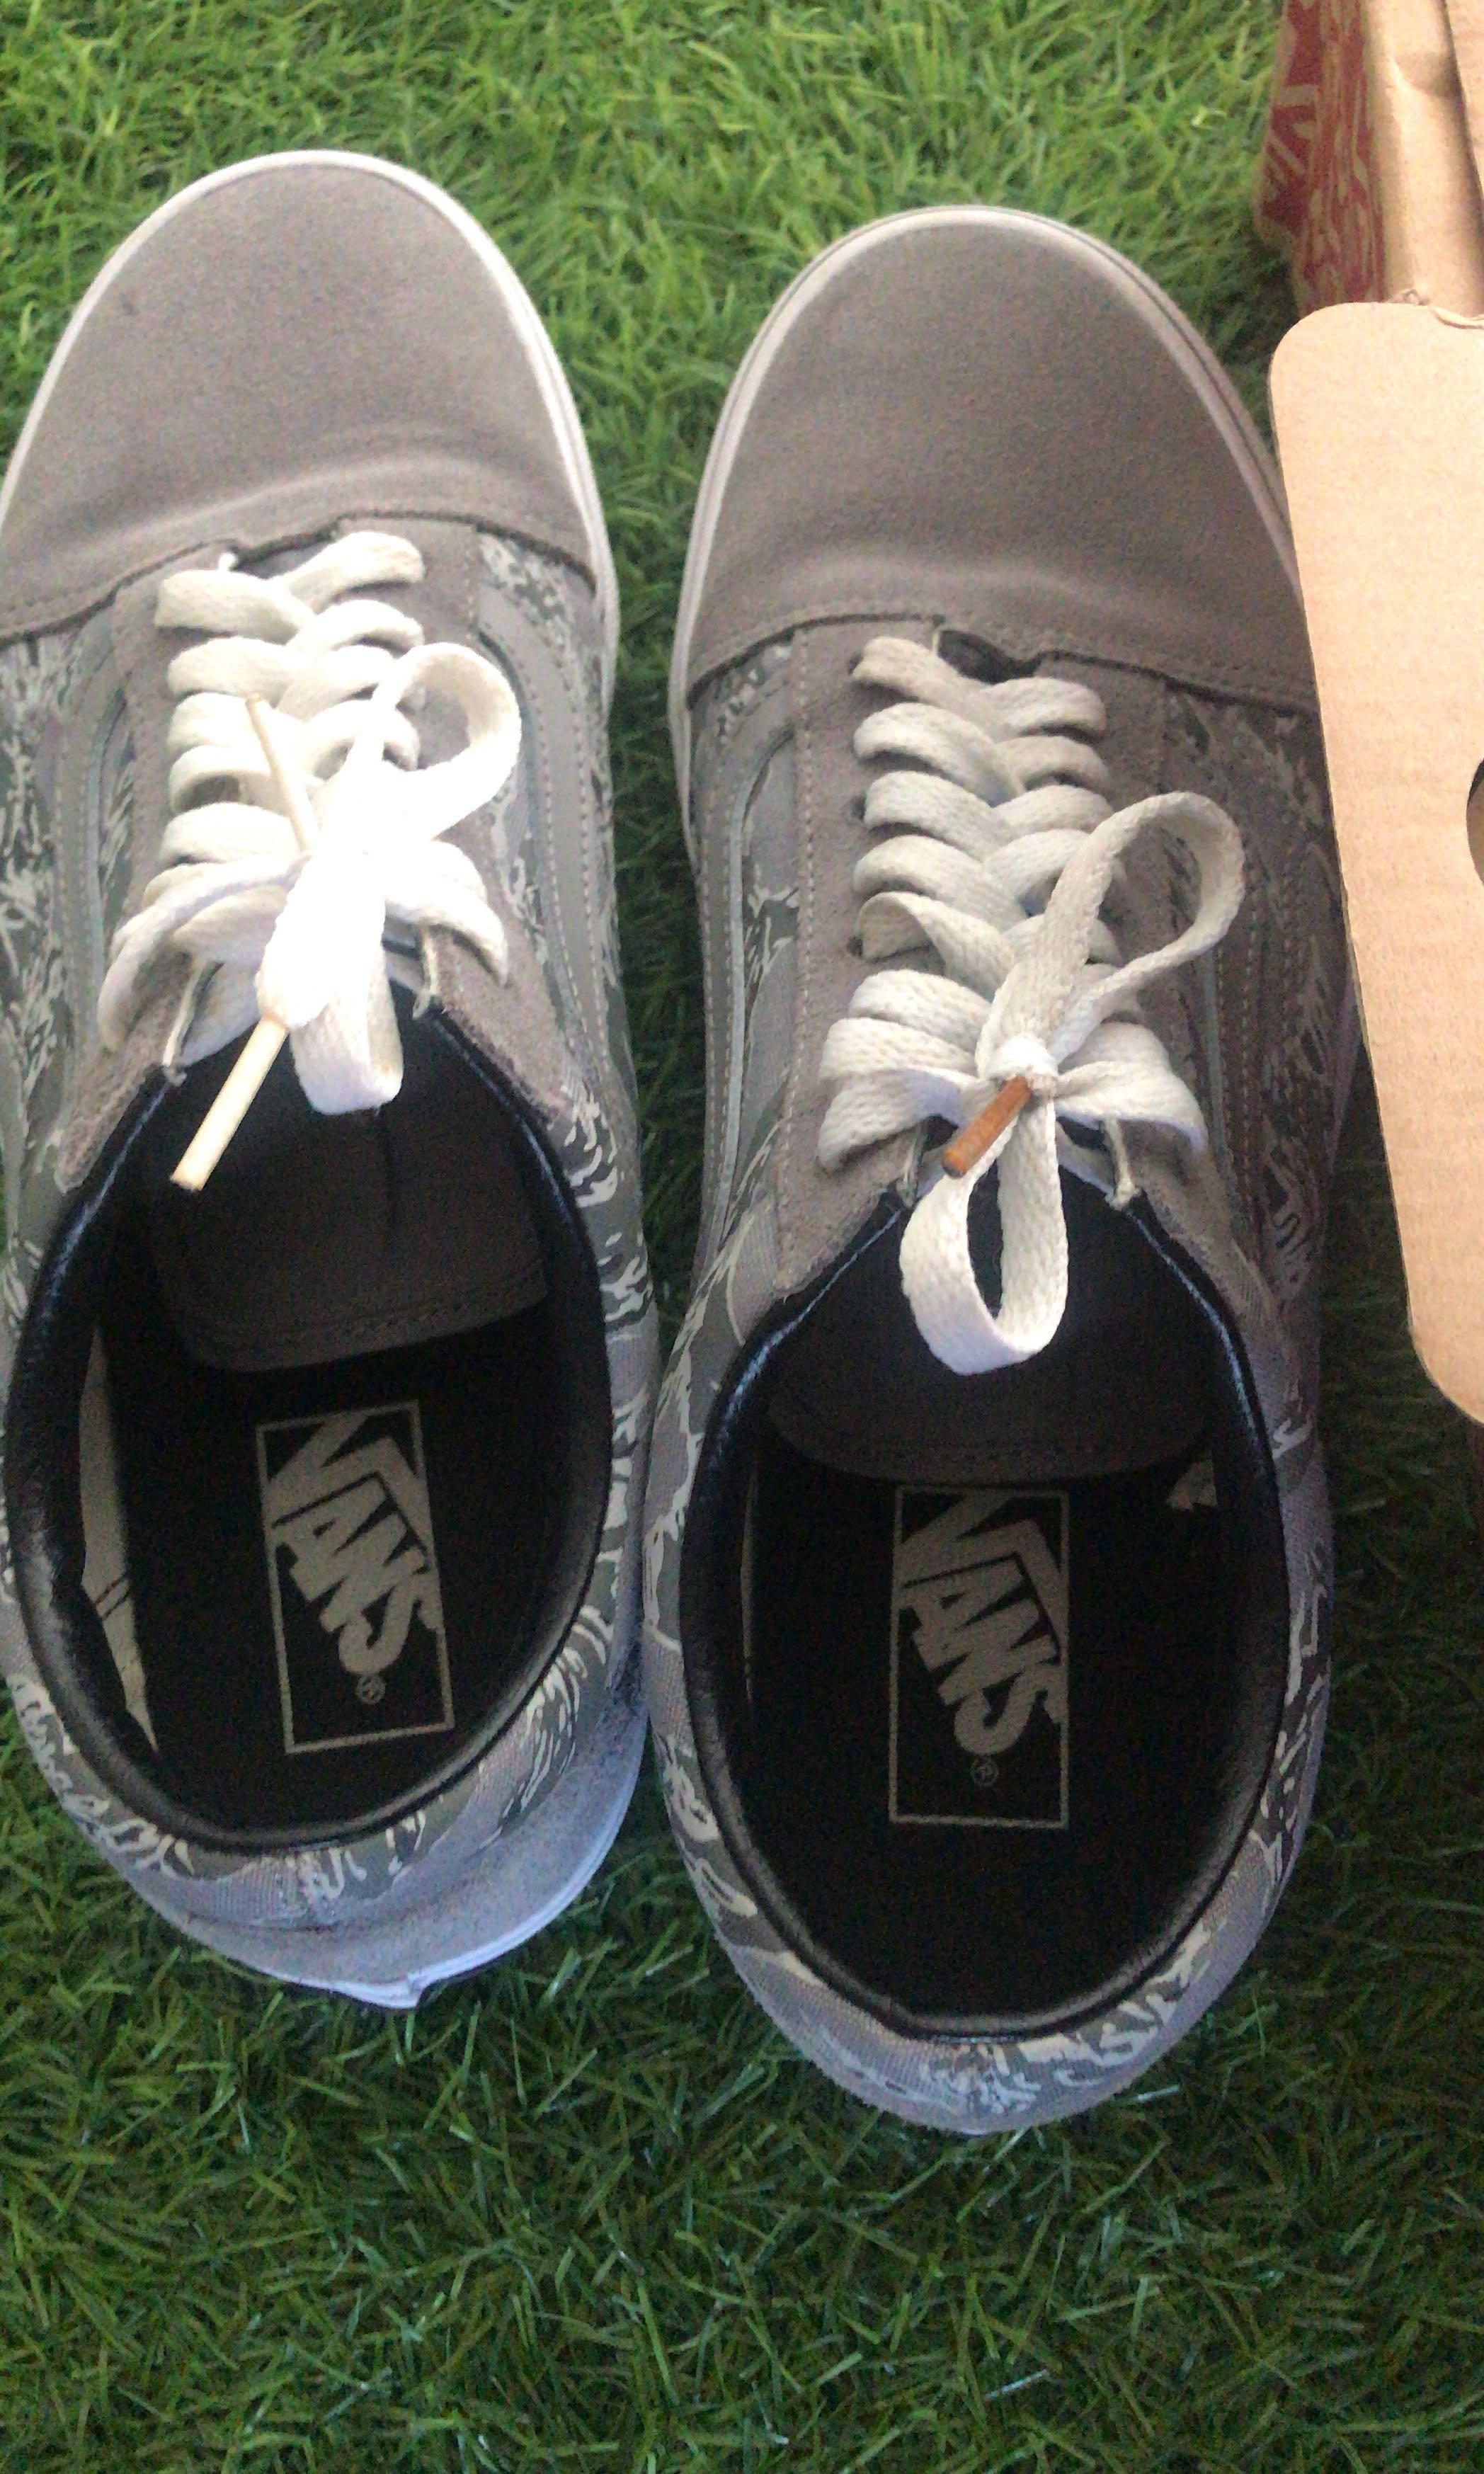 3e331a294f80f Vans JD Sports Edition, Fesyen Lelaki, Kasut Lelaki, Sneakers di ...